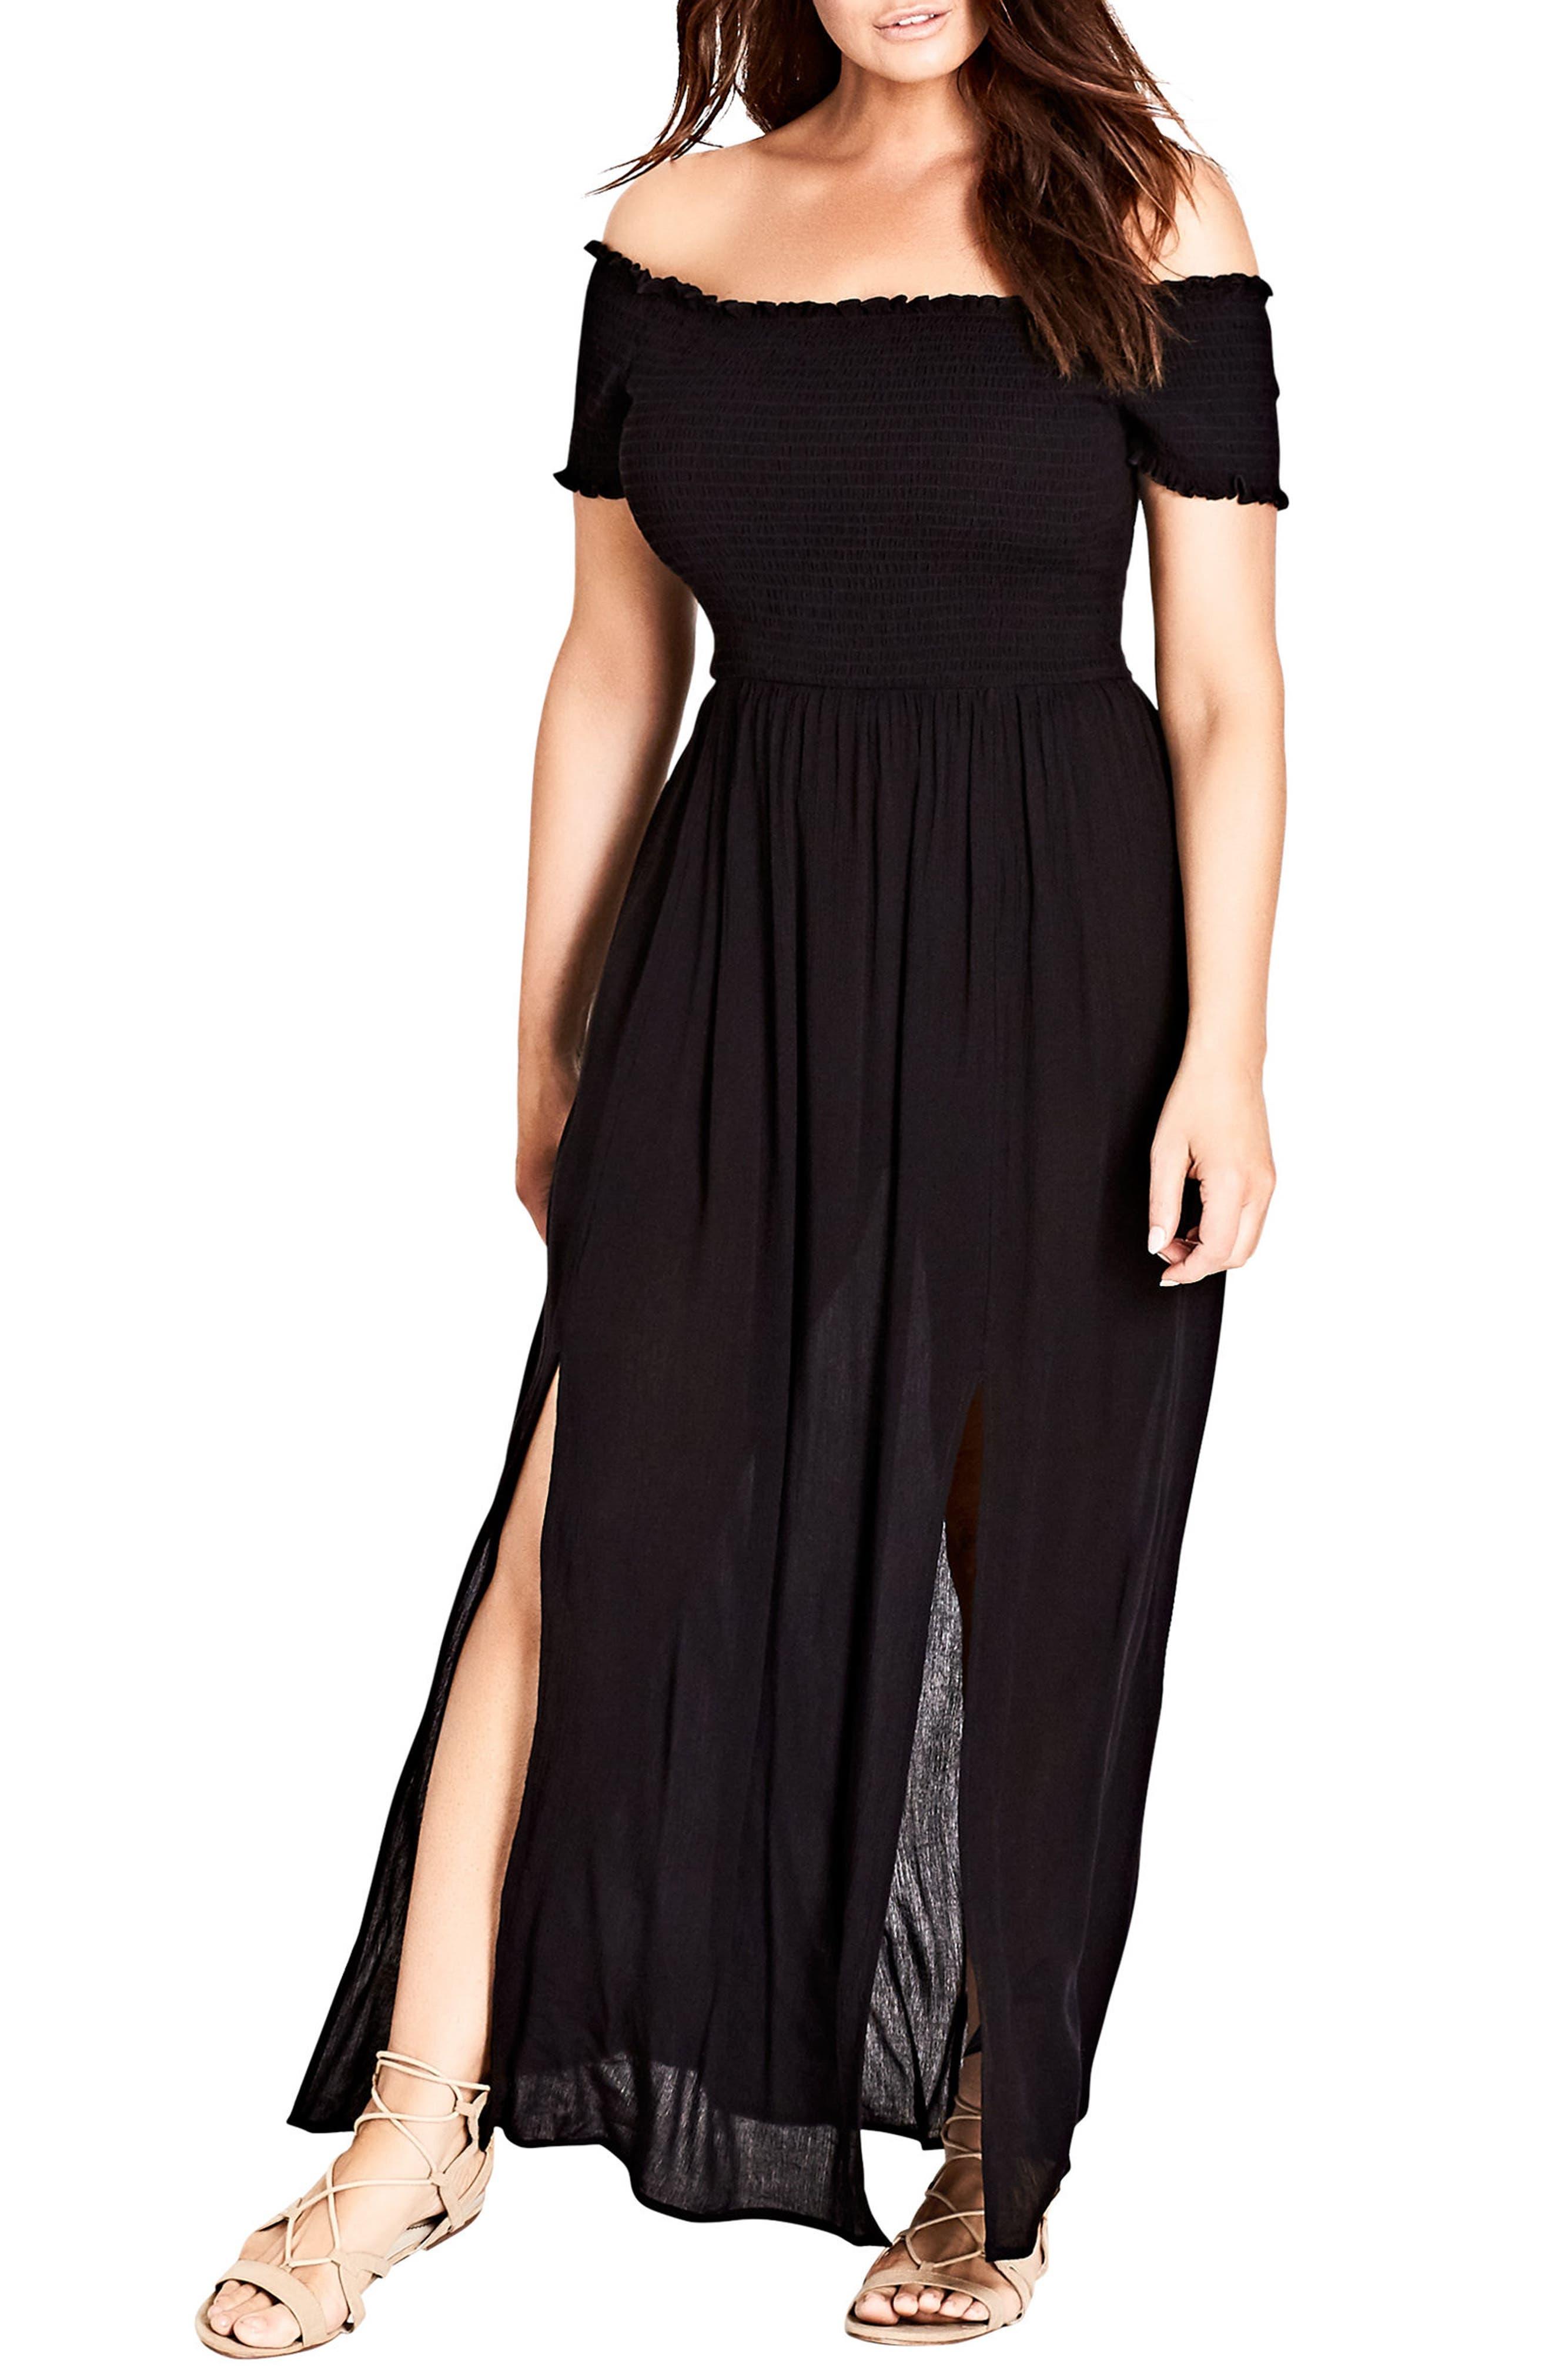 CITY CHIC, Smocked Off the Shoulder Maxi Dress, Main thumbnail 1, color, BLACK